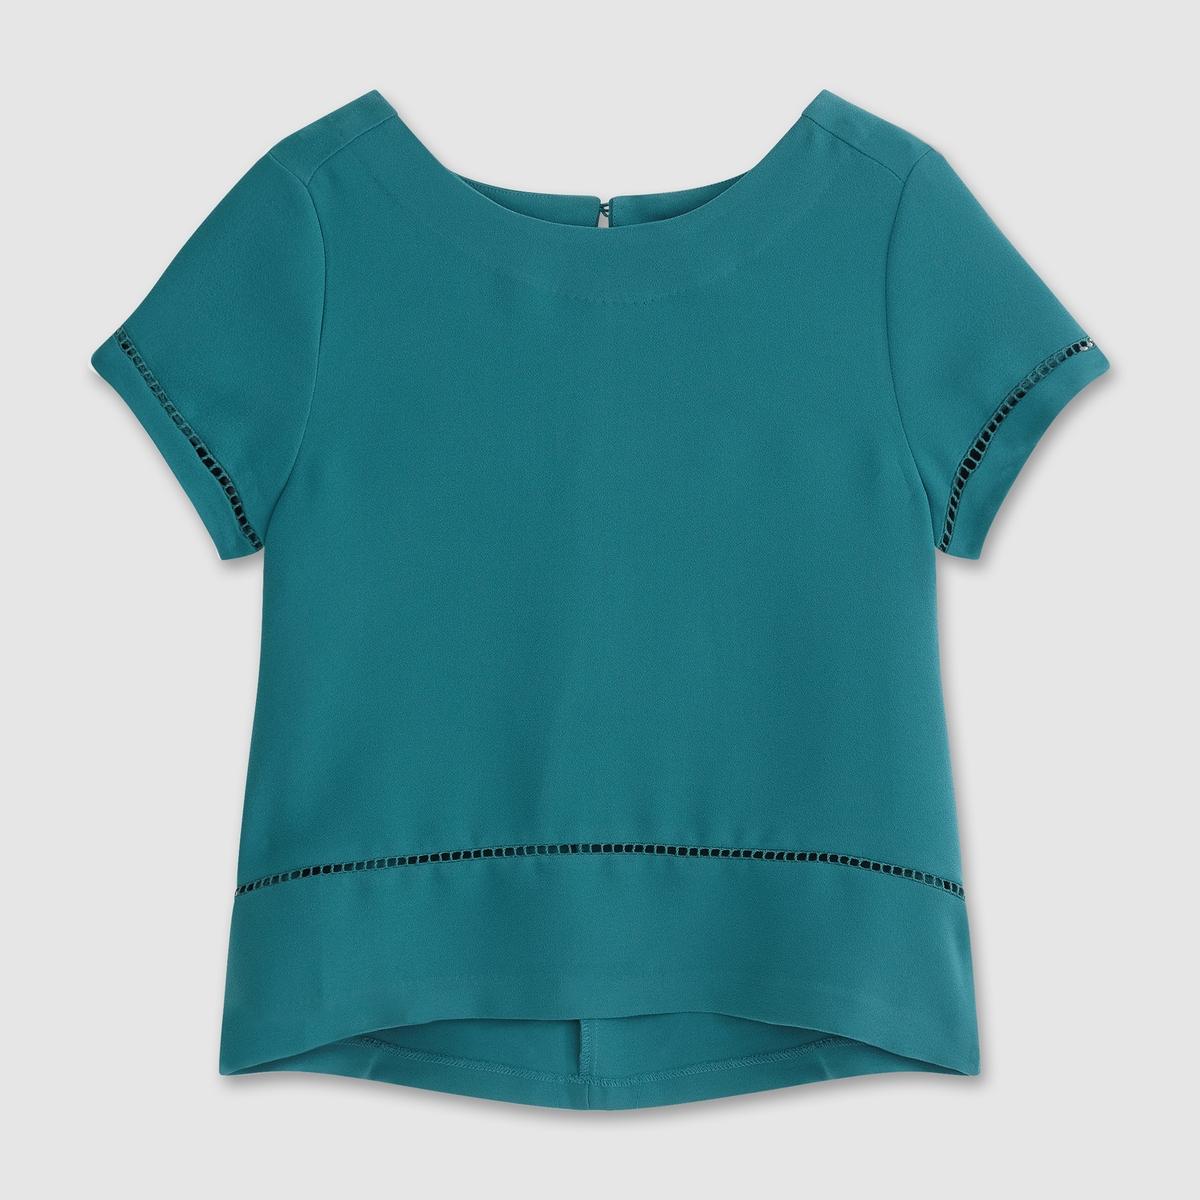 Блузка с короткими рукавами TILDA